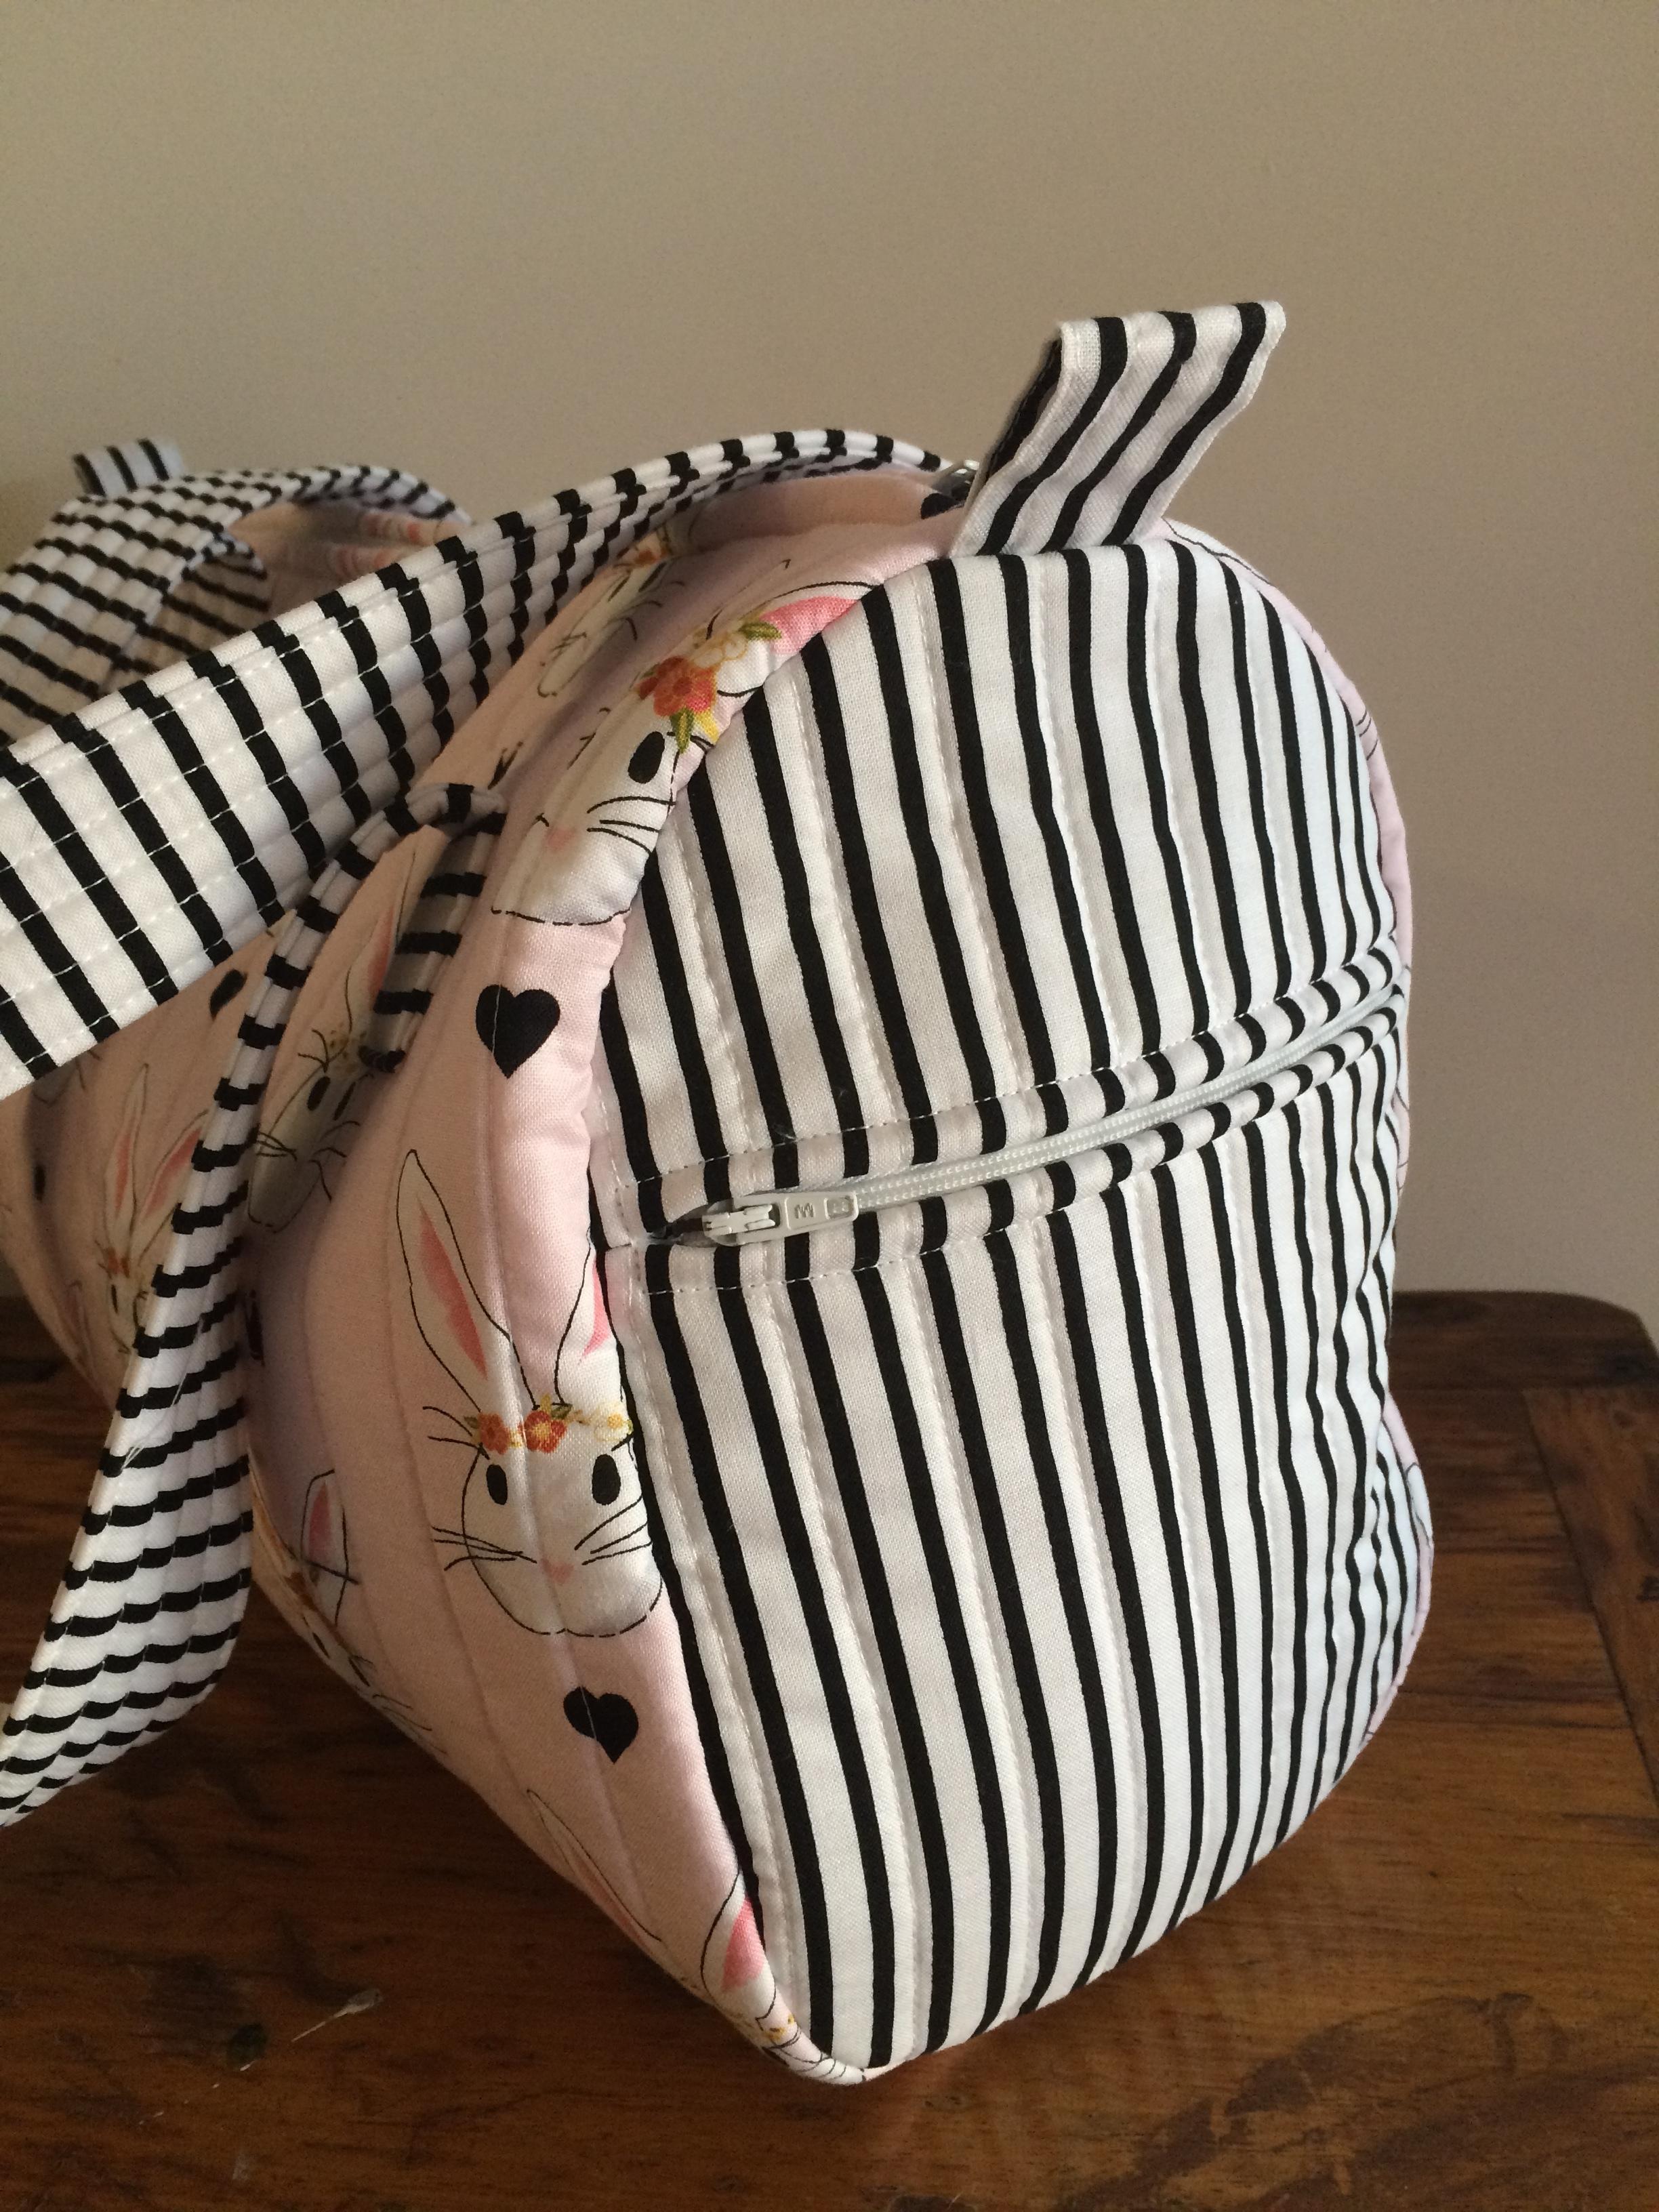 A zipped bag end.